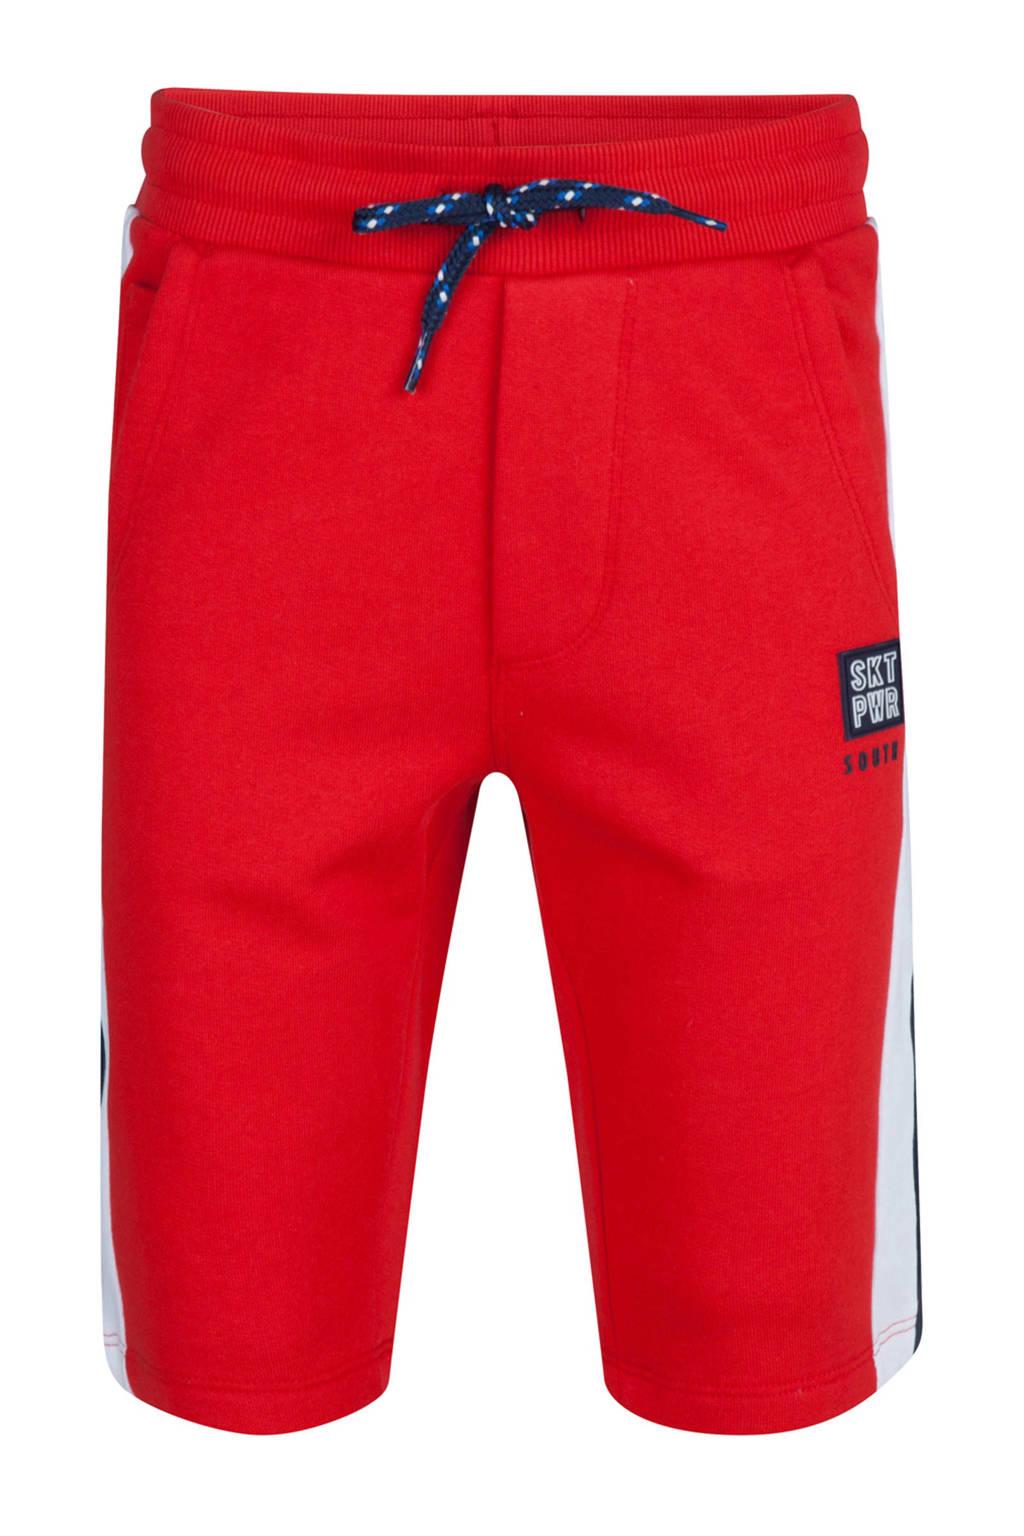 WE Fashion sweatshort met zijstreep rood, Rood